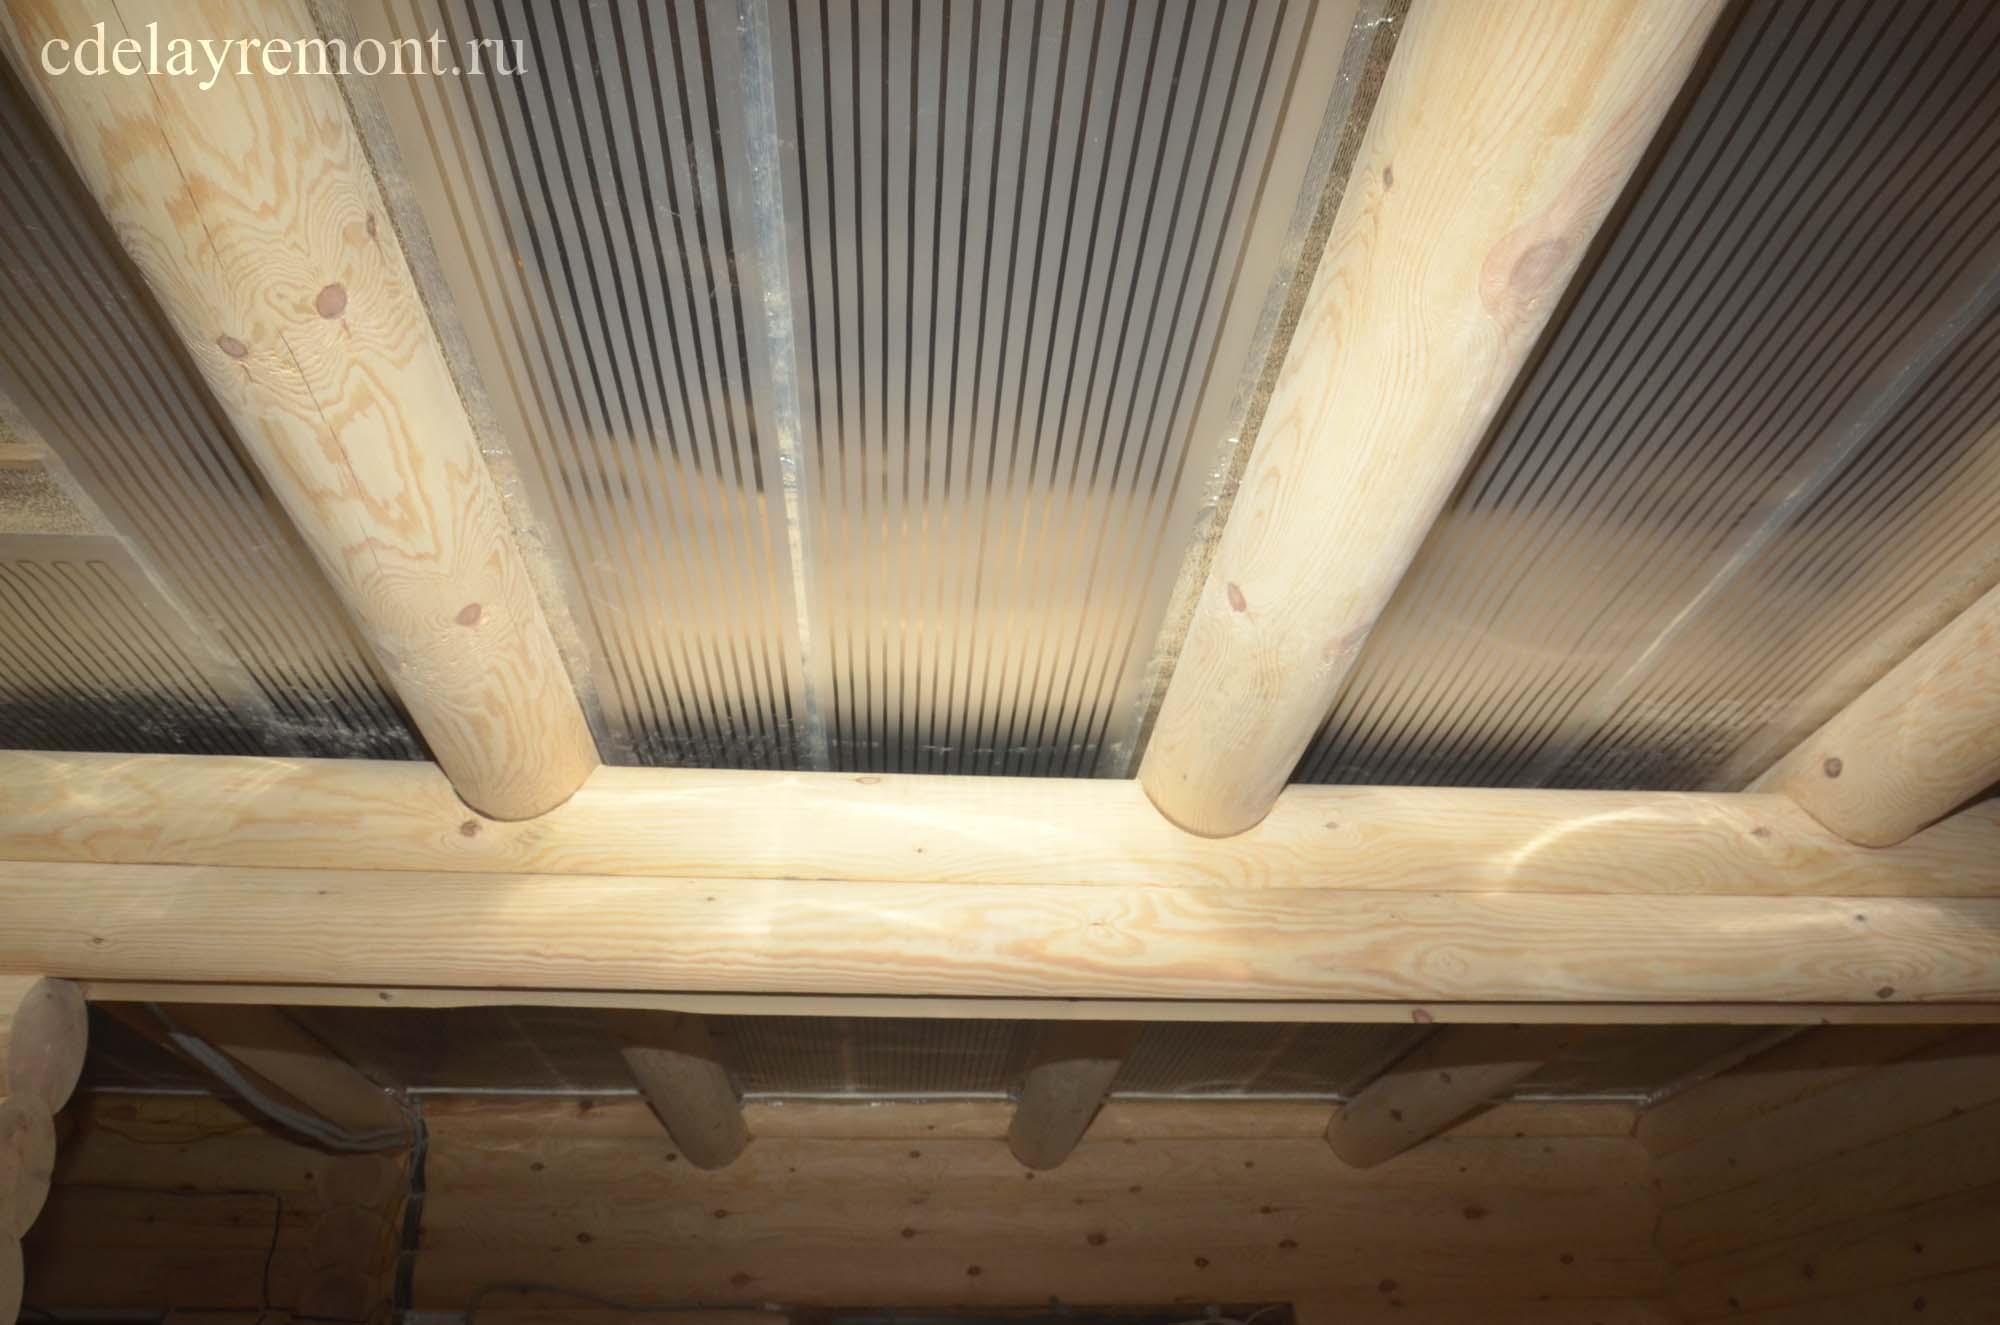 Отопление ПЛЭН на потолке